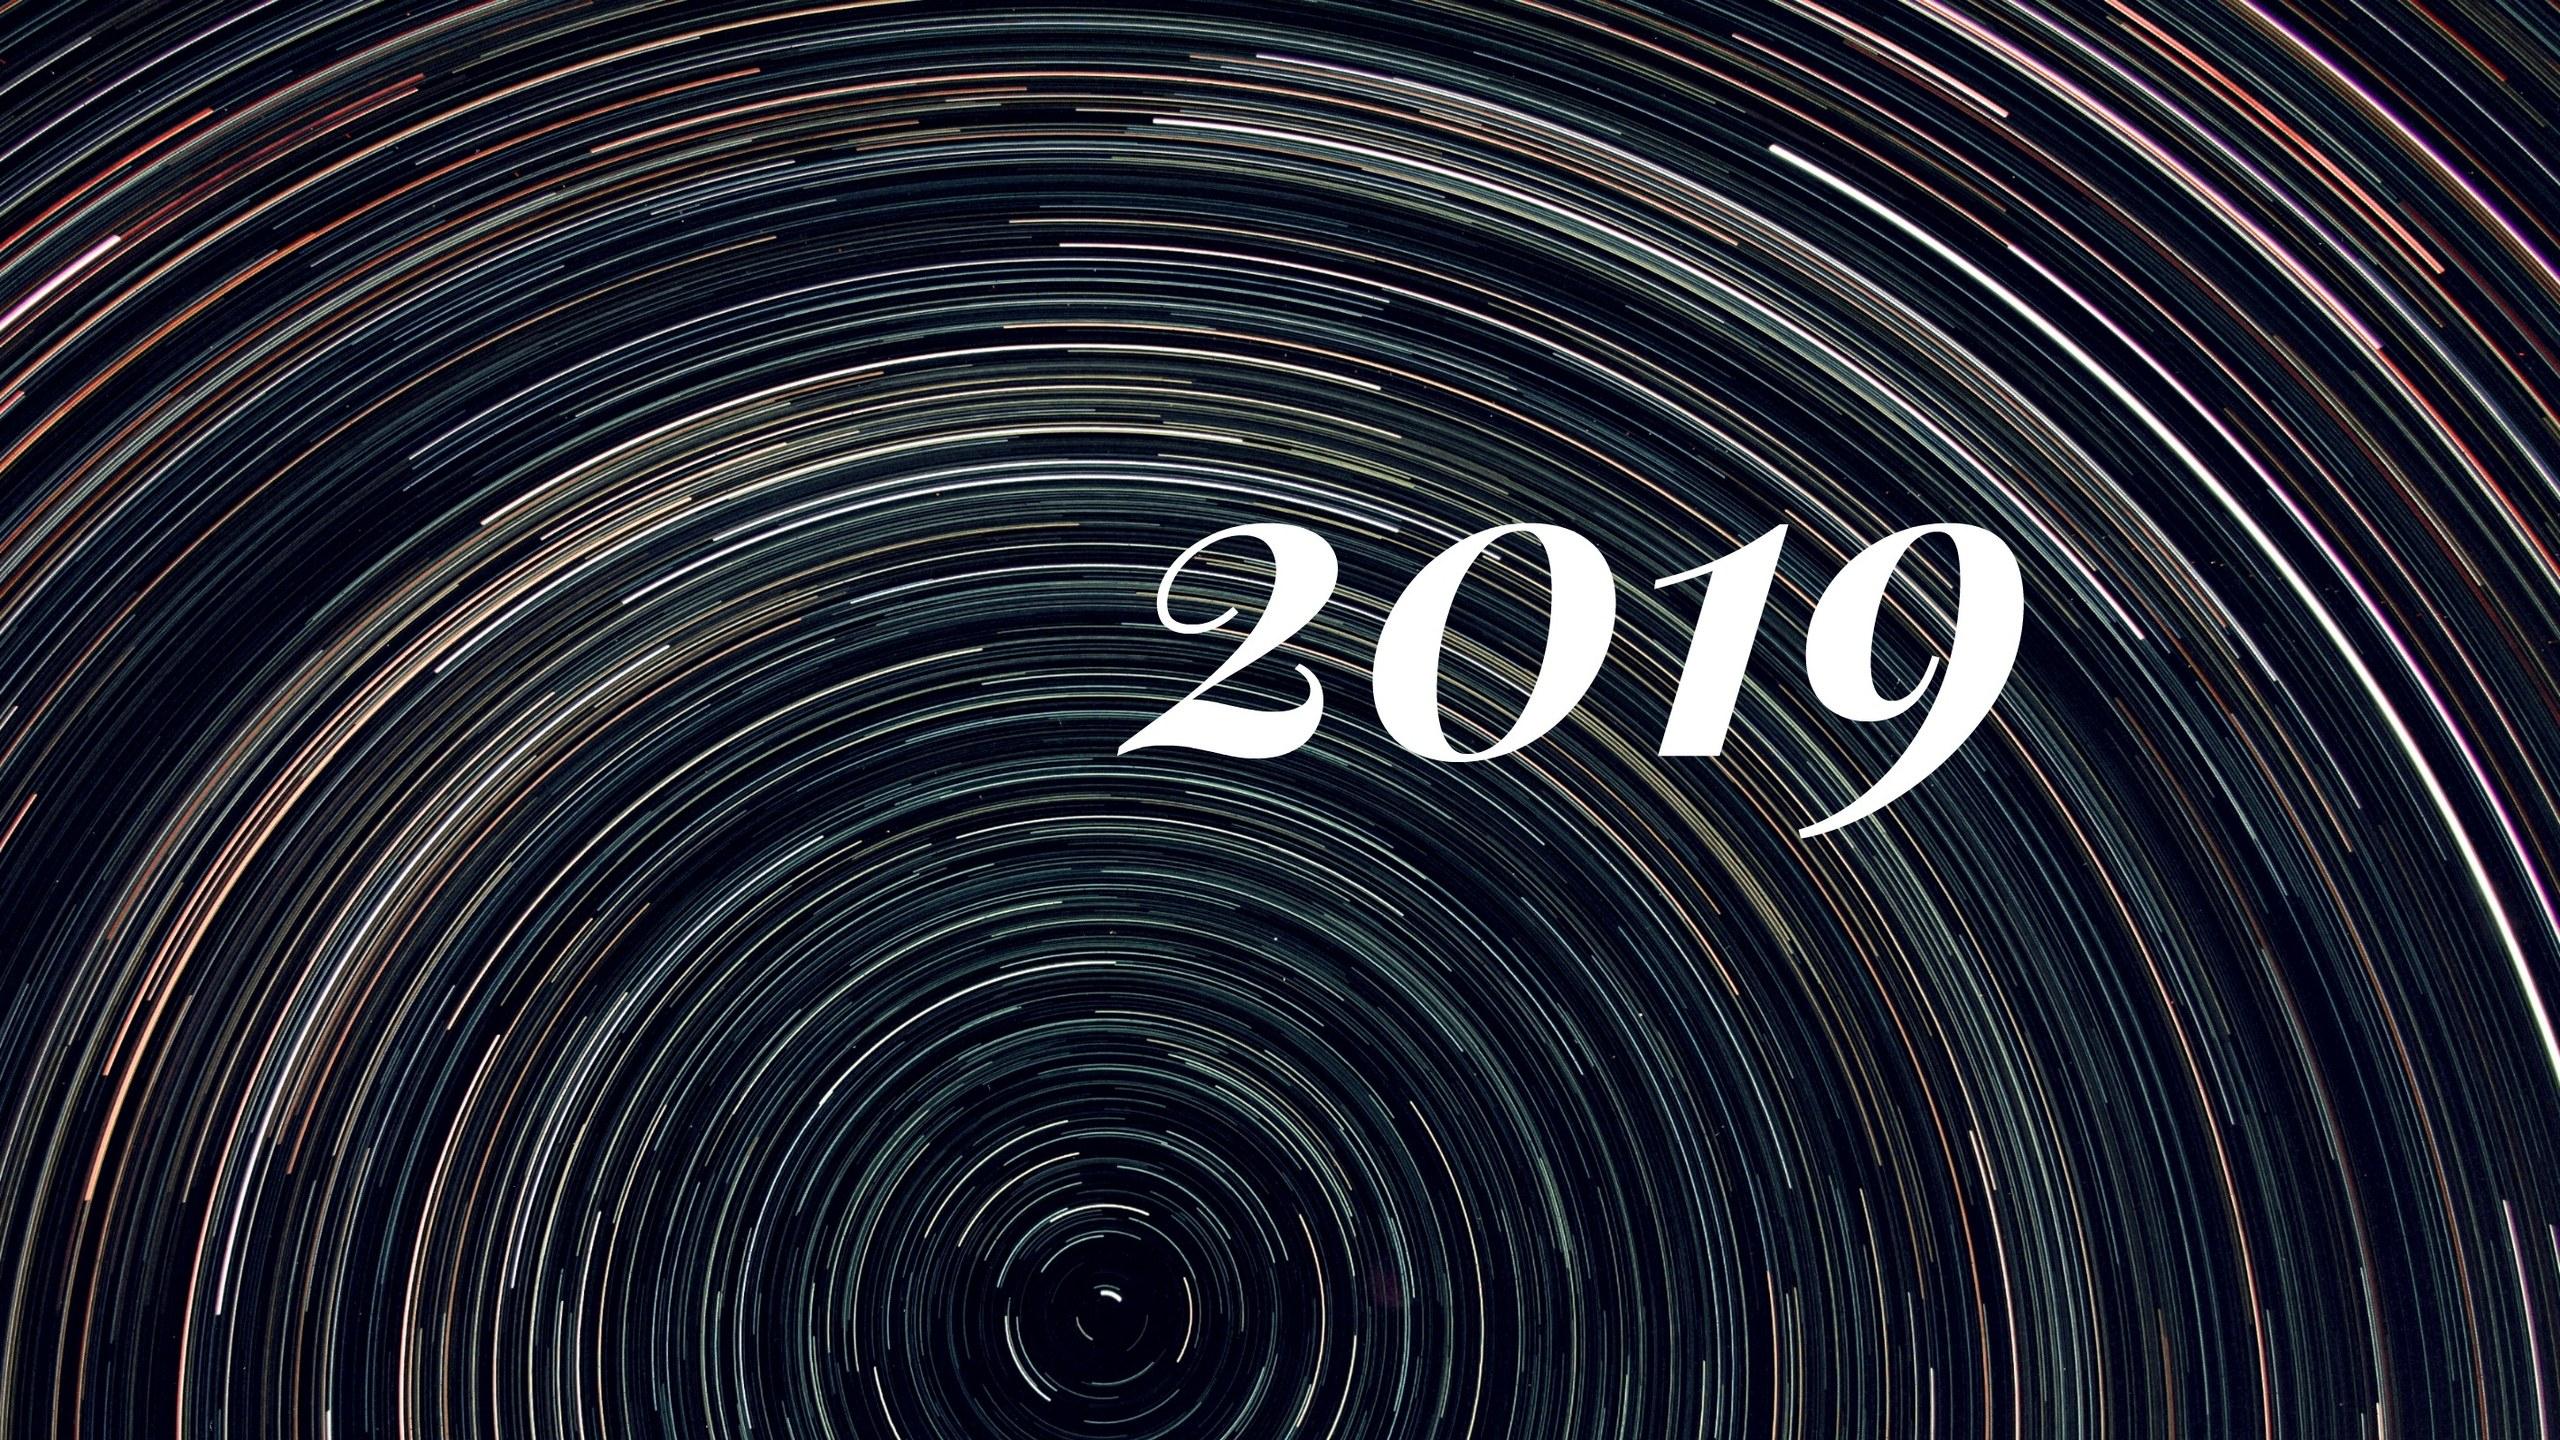 Lunar Hair Chart January 2018  Bobi.karikaturize inside Anthony Morrocco Lunar Hair Cutting Chart 2020